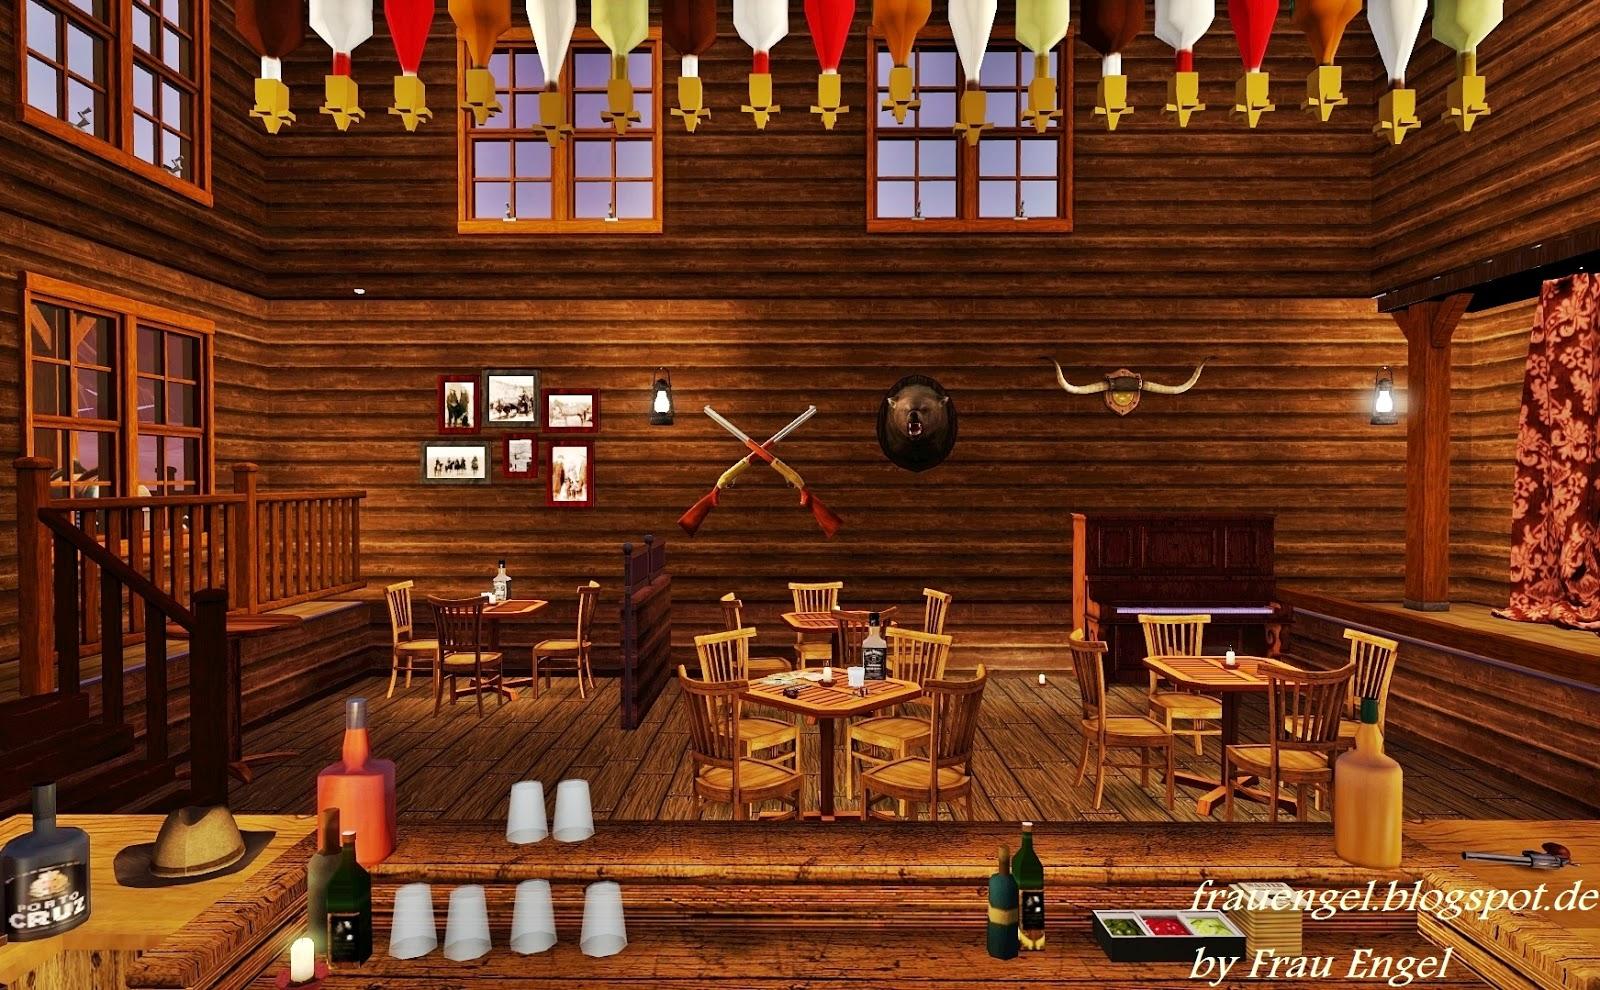 Old western saloon decor